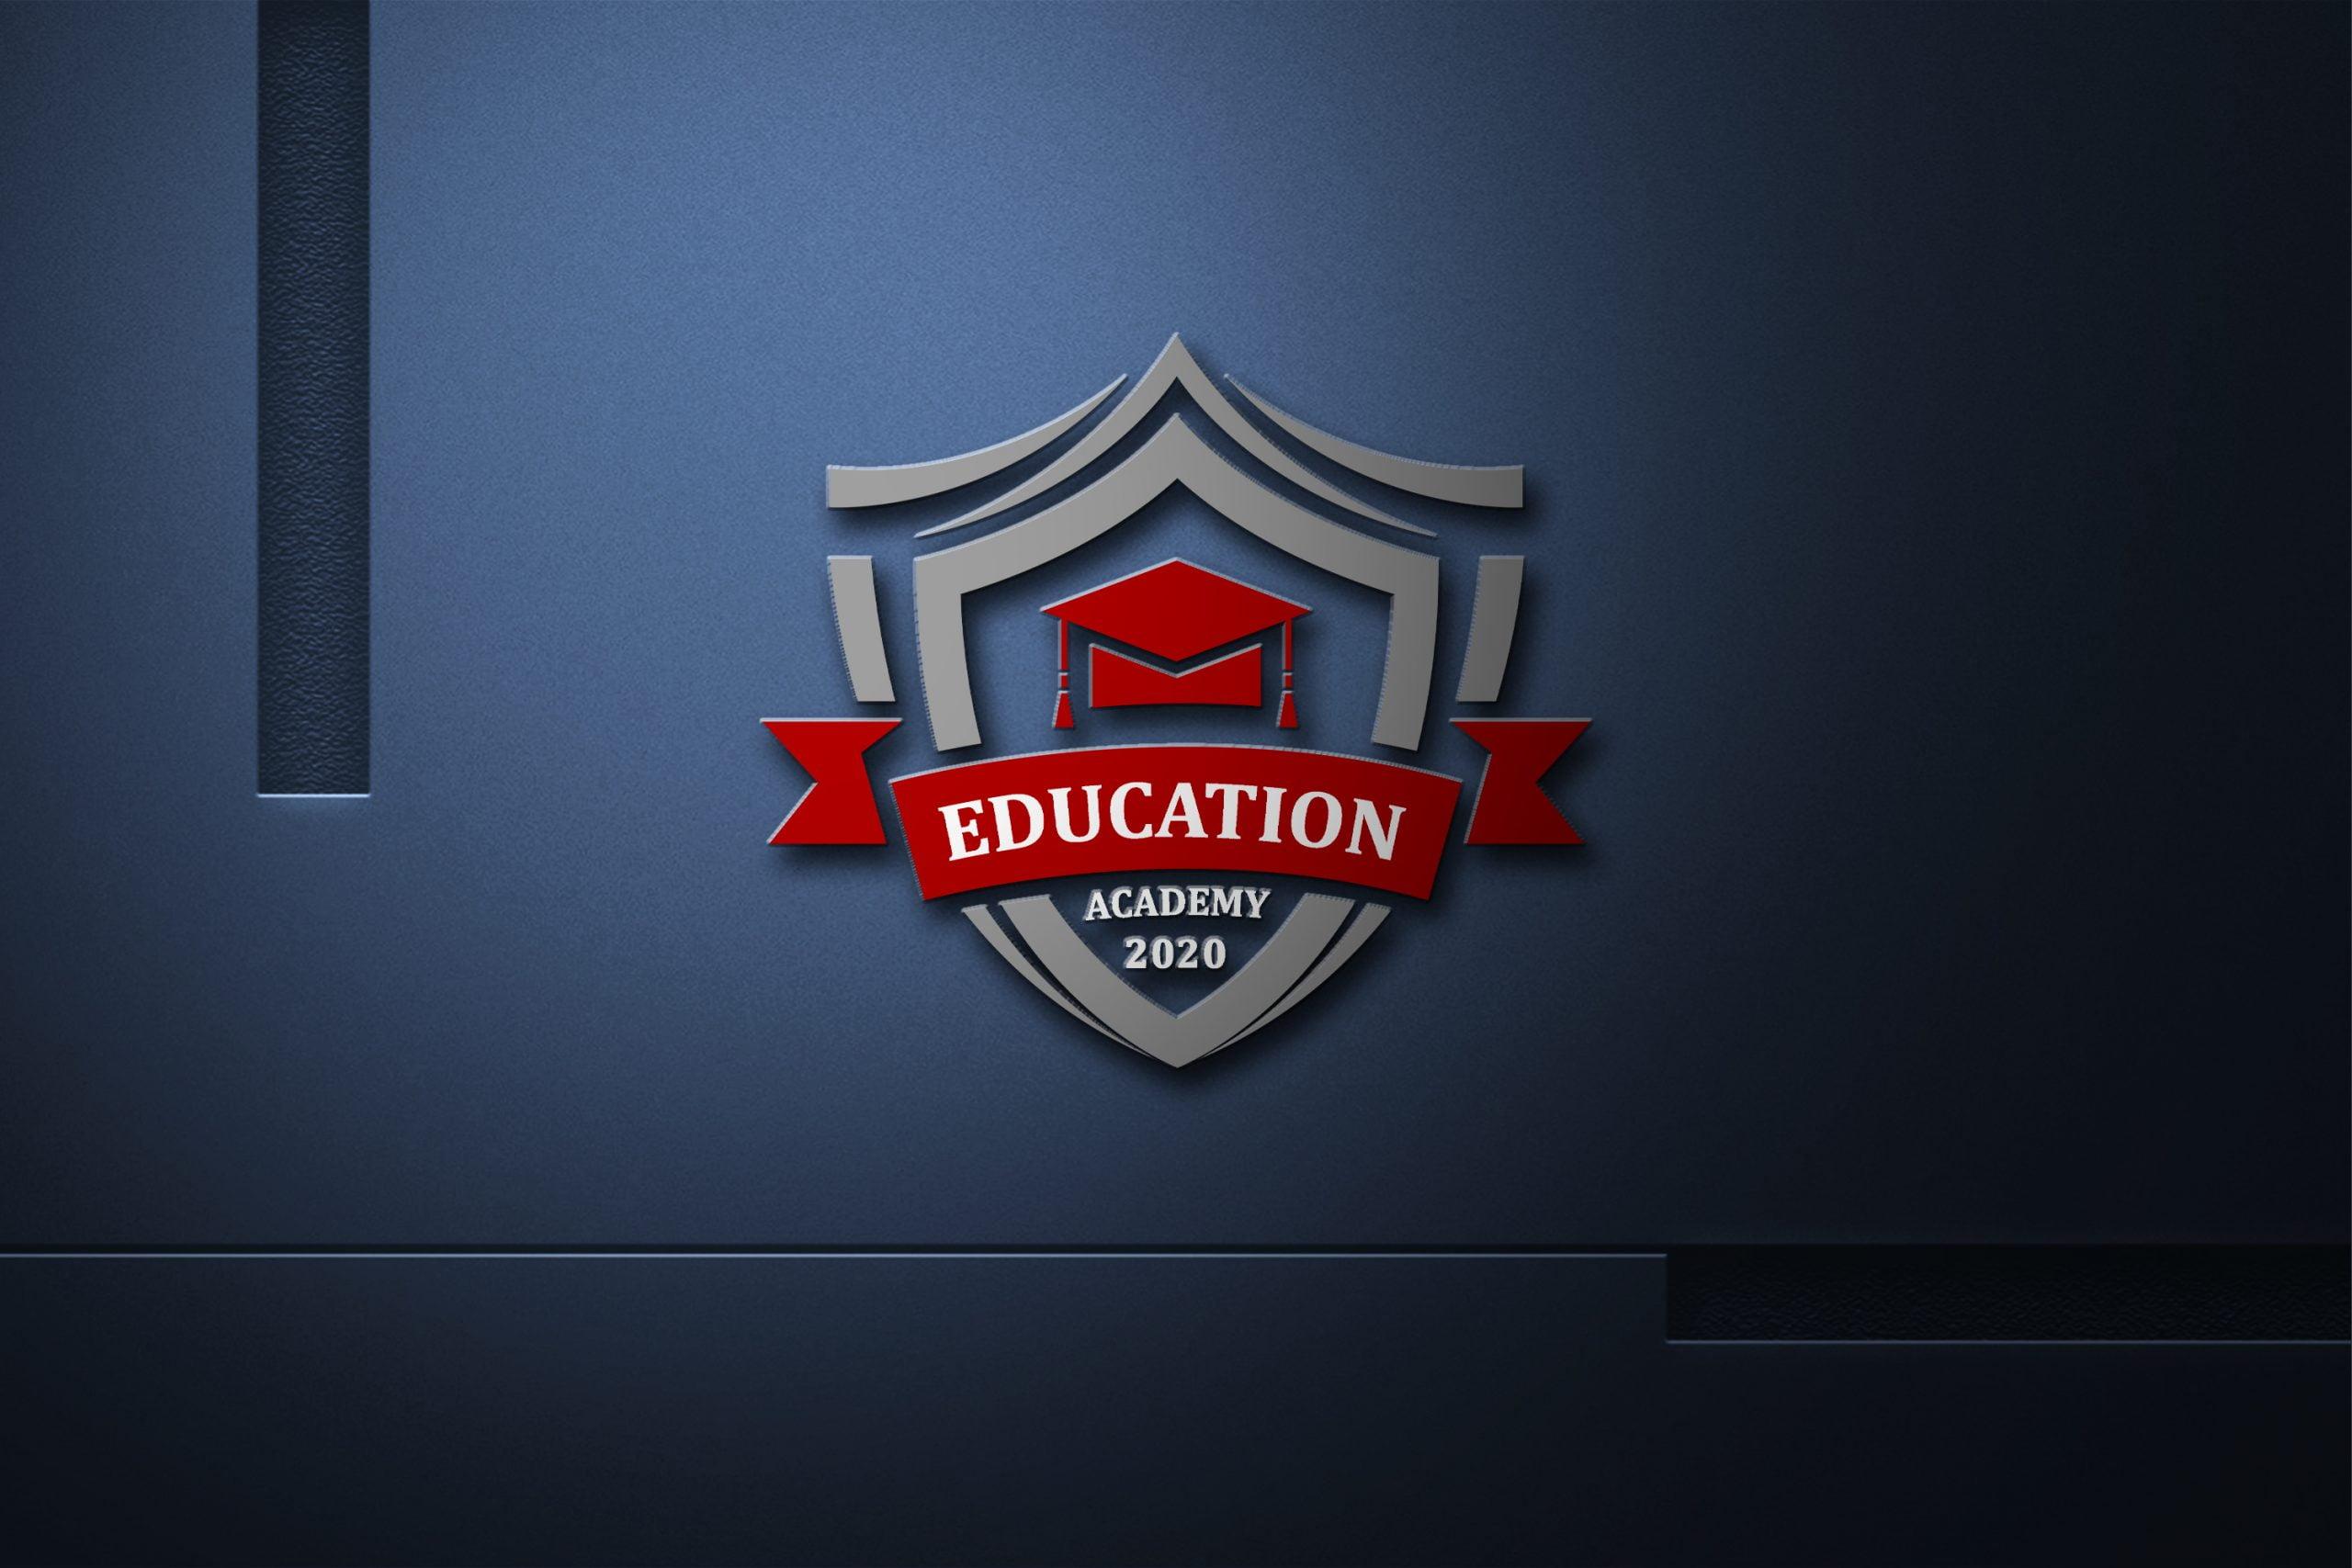 Education Academy Logo On dark wall